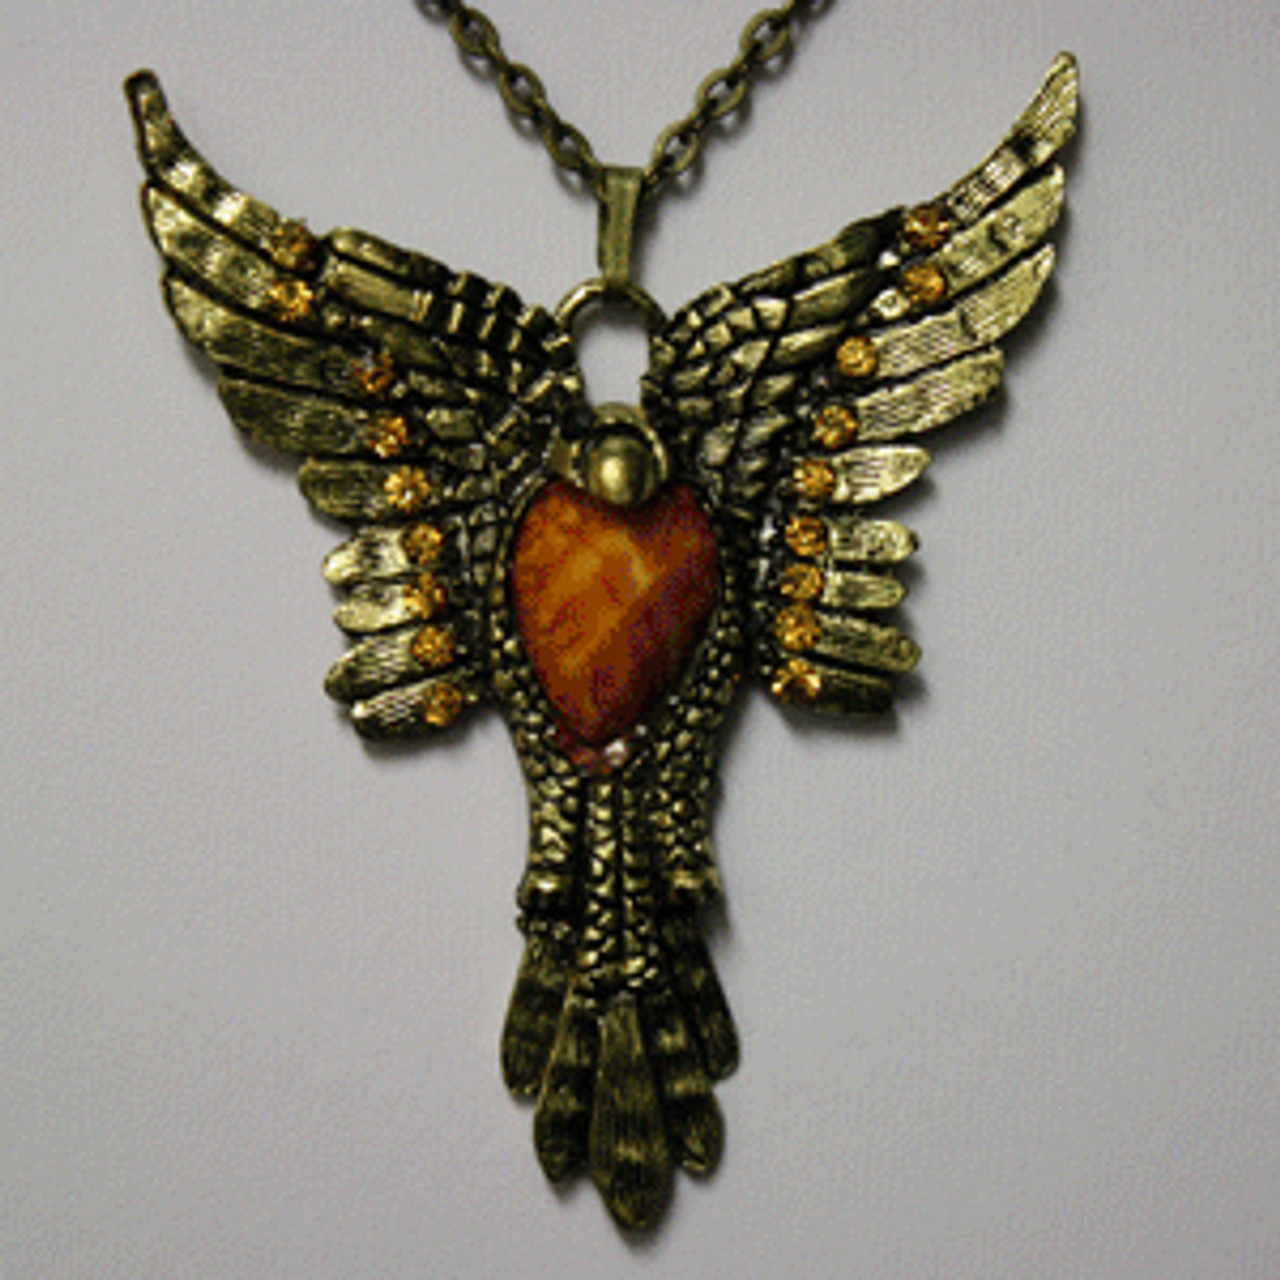 Eagle necklaces